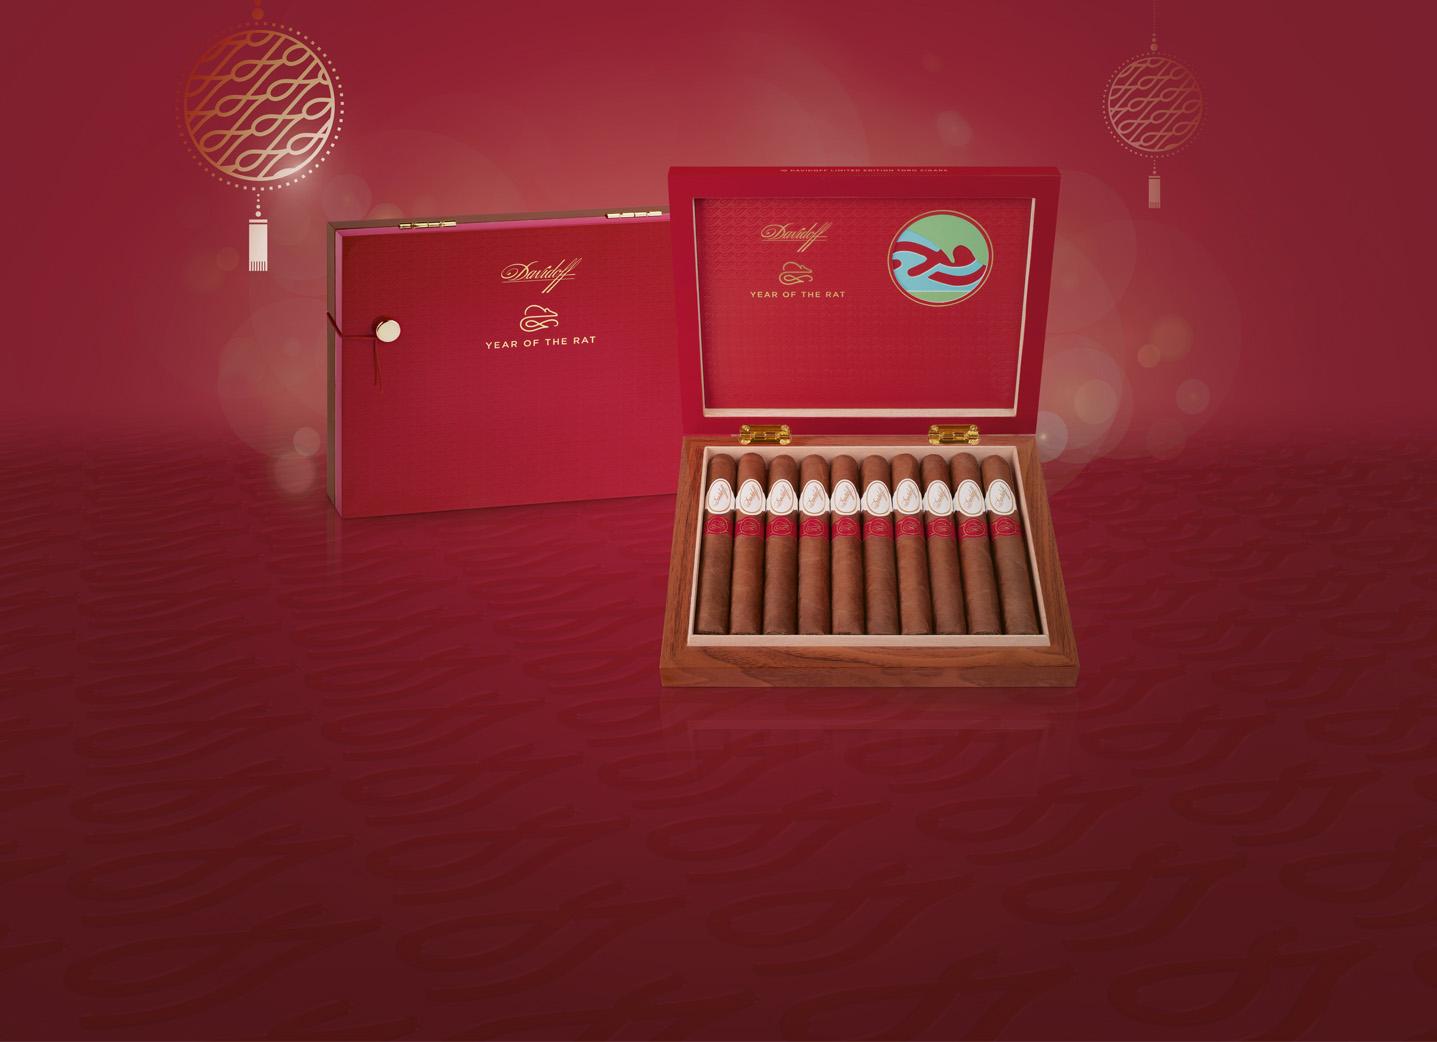 Year of the Rat 2020 Davidoff cigars